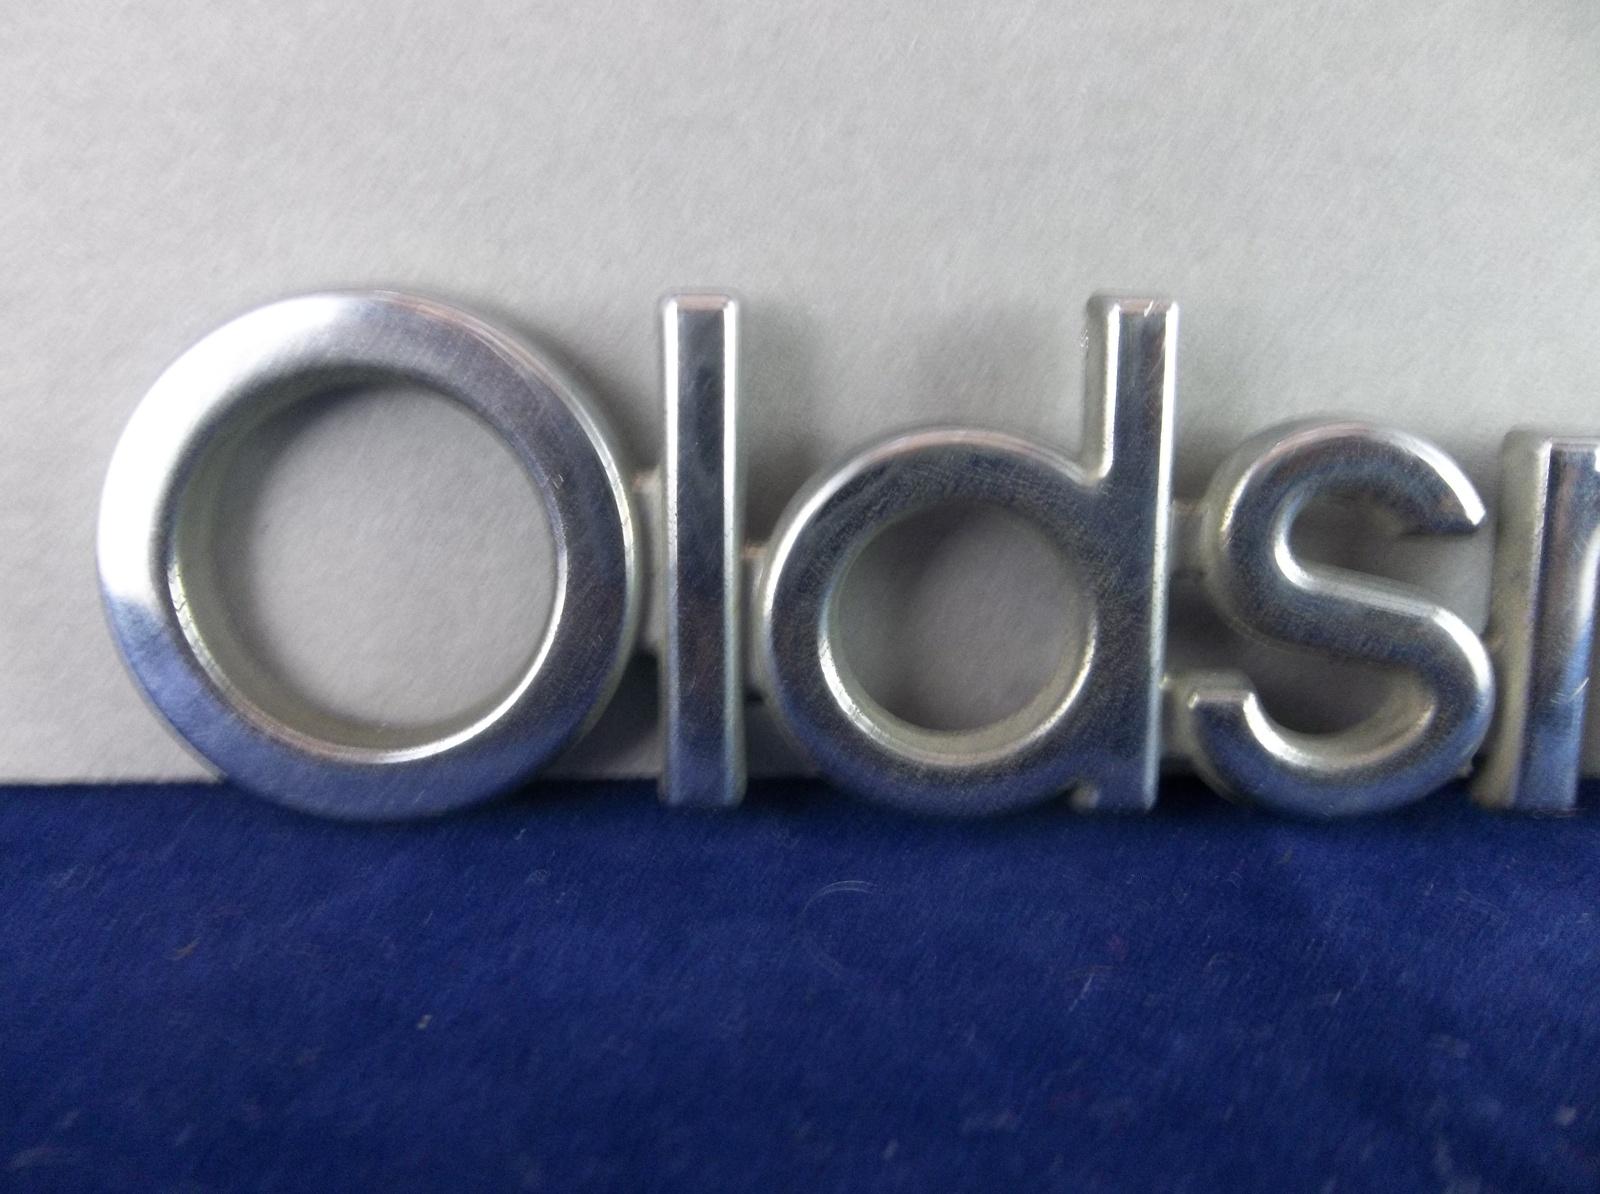 1984-1996 Oldsmobile Cutlass Ciera 88 98 Chrome Plastic Script Emblem OEM